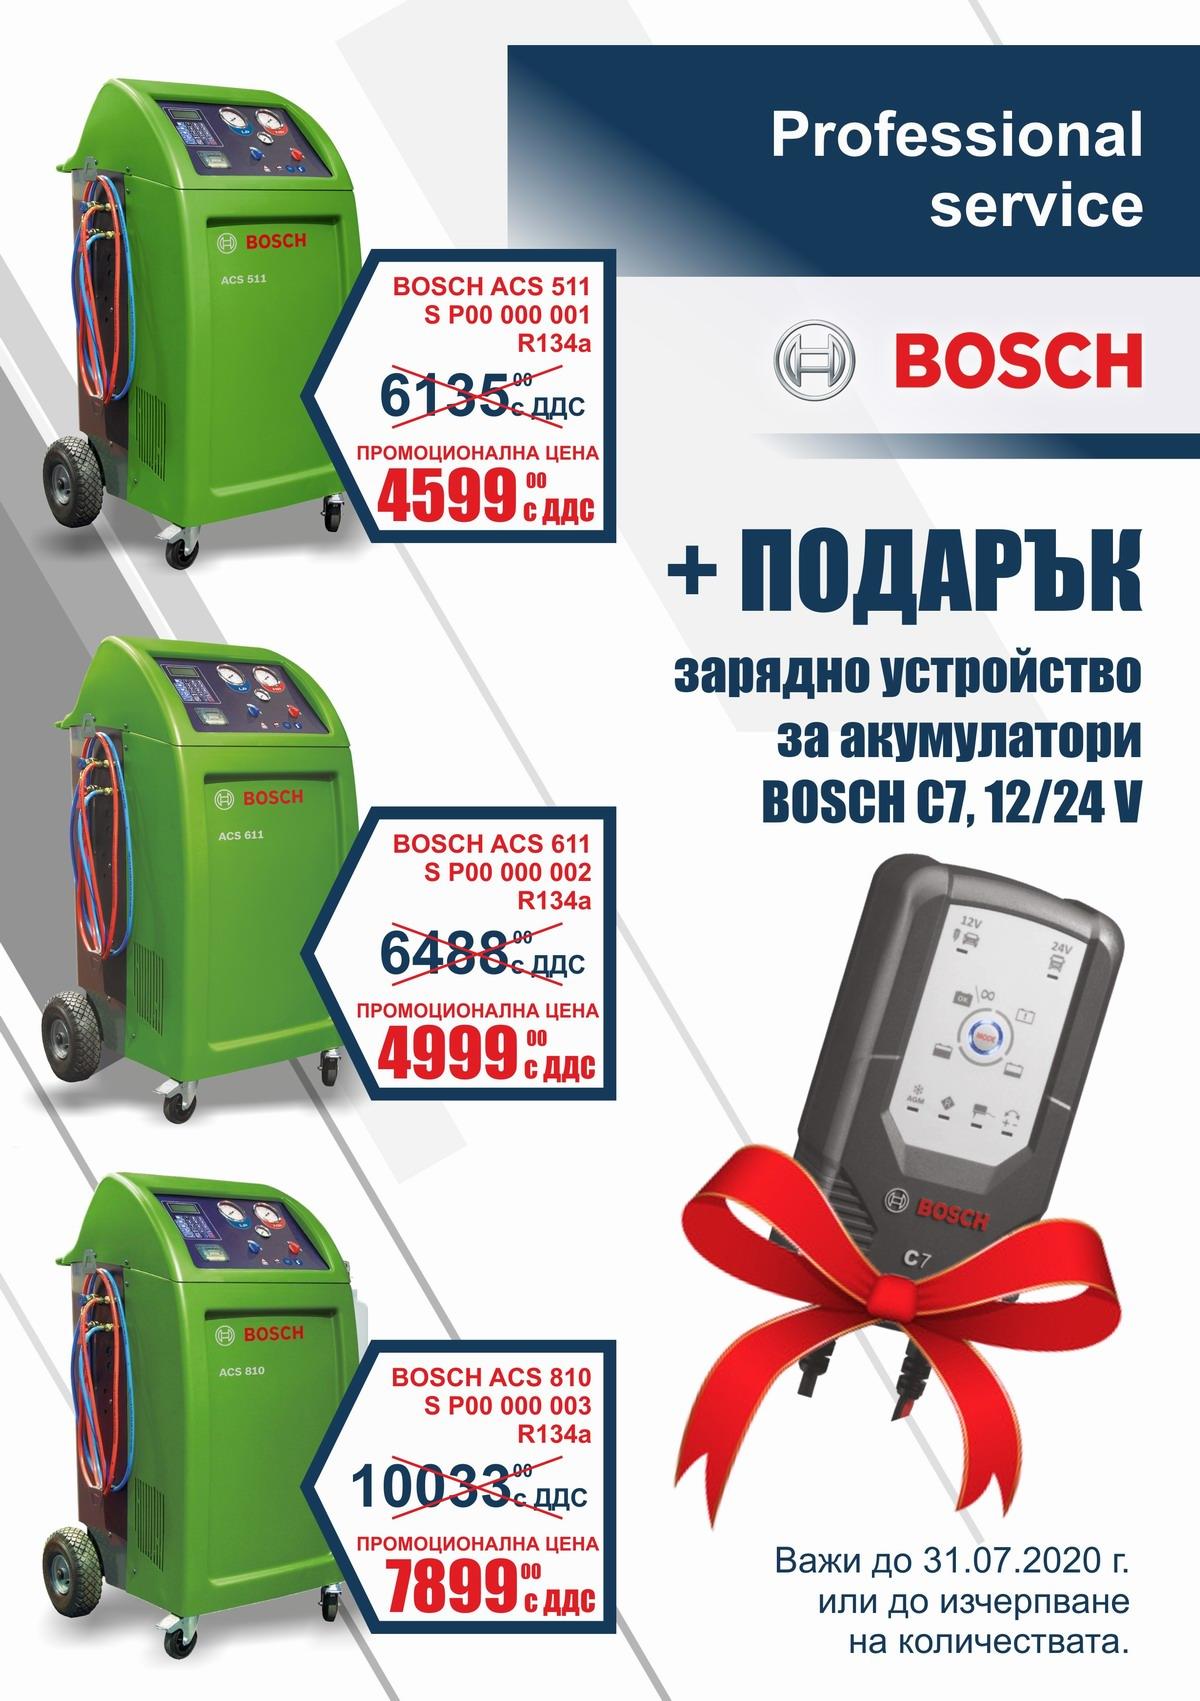 Промоция BOSCH - ACS 511, ACS 611, ACS 810 - до 31.07.2020